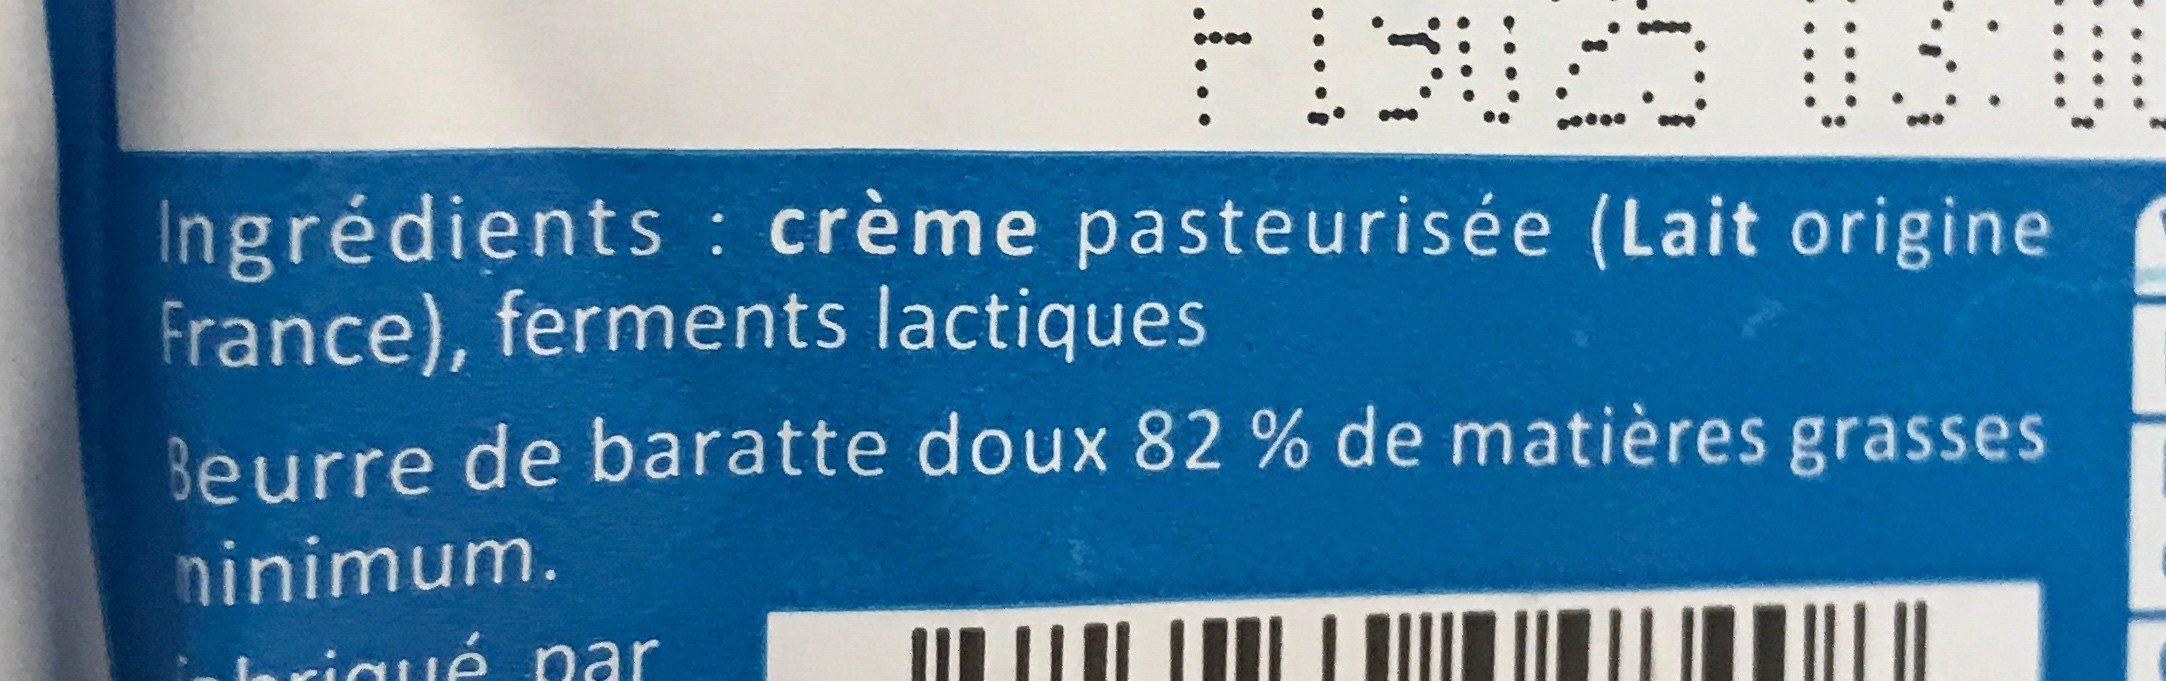 Beurre de Baratte Bleu-Blanc-Coeur - Ingredients - fr